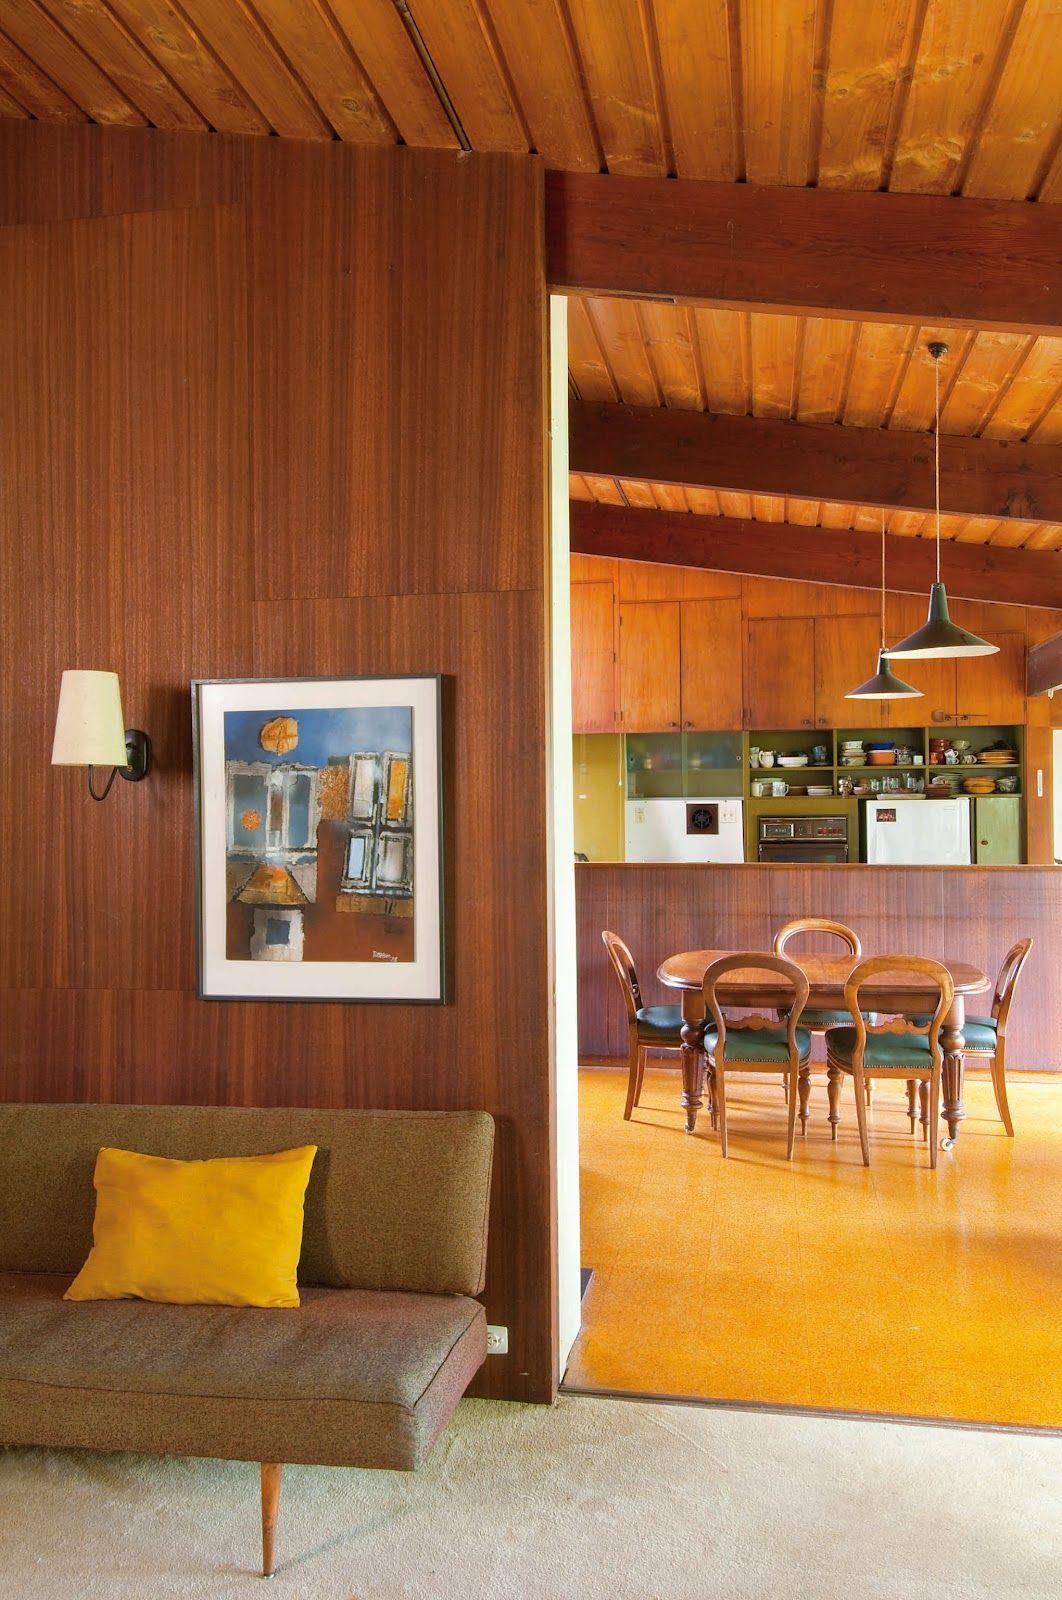 under threat the 1955 lomas house hamilton new zealand - 1955 Home Design